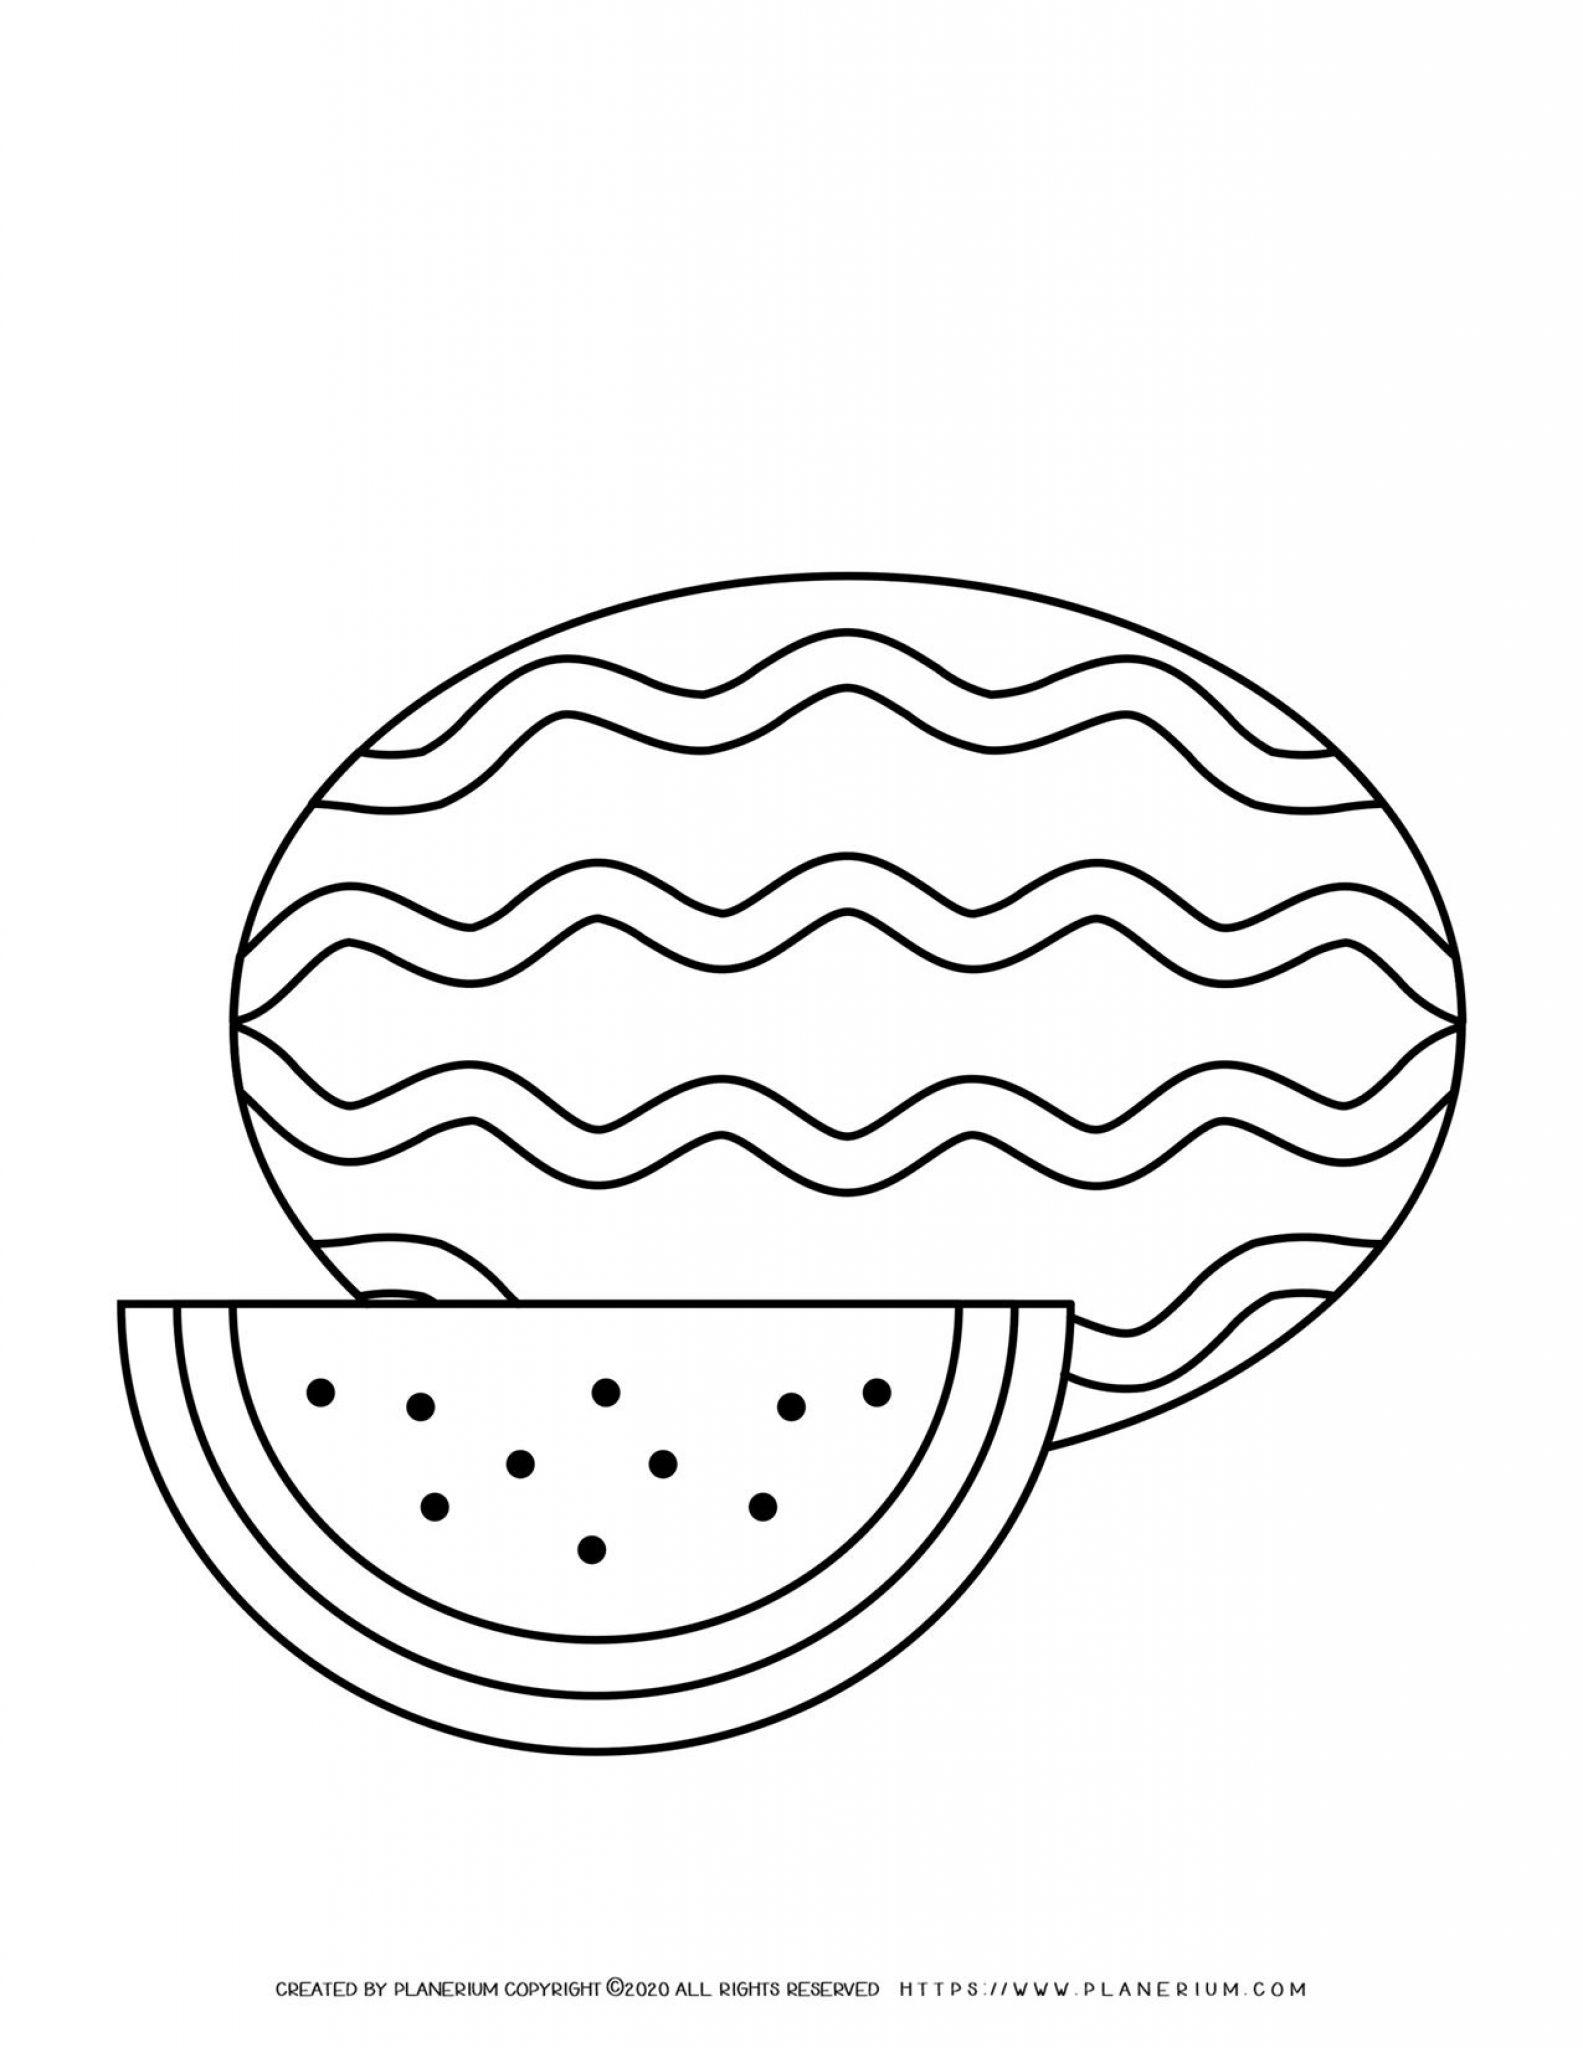 Watermelon - Coloring page | Planerium